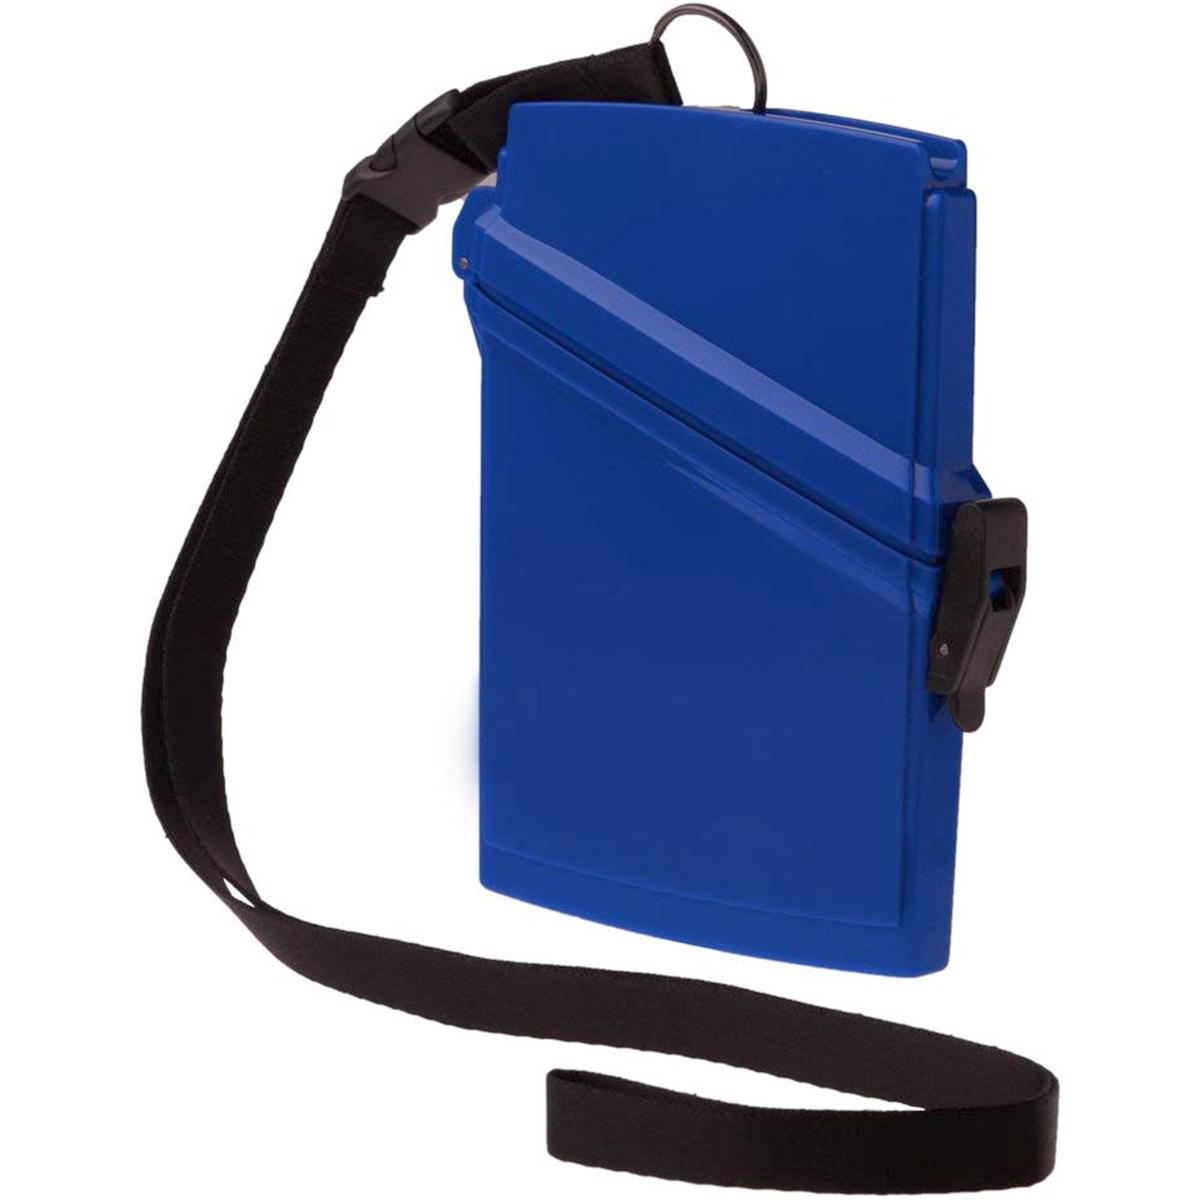 Witz-Passport-Locker-Lightweight-Waterproof-Sport-Case-with-Lanyard miniature 5